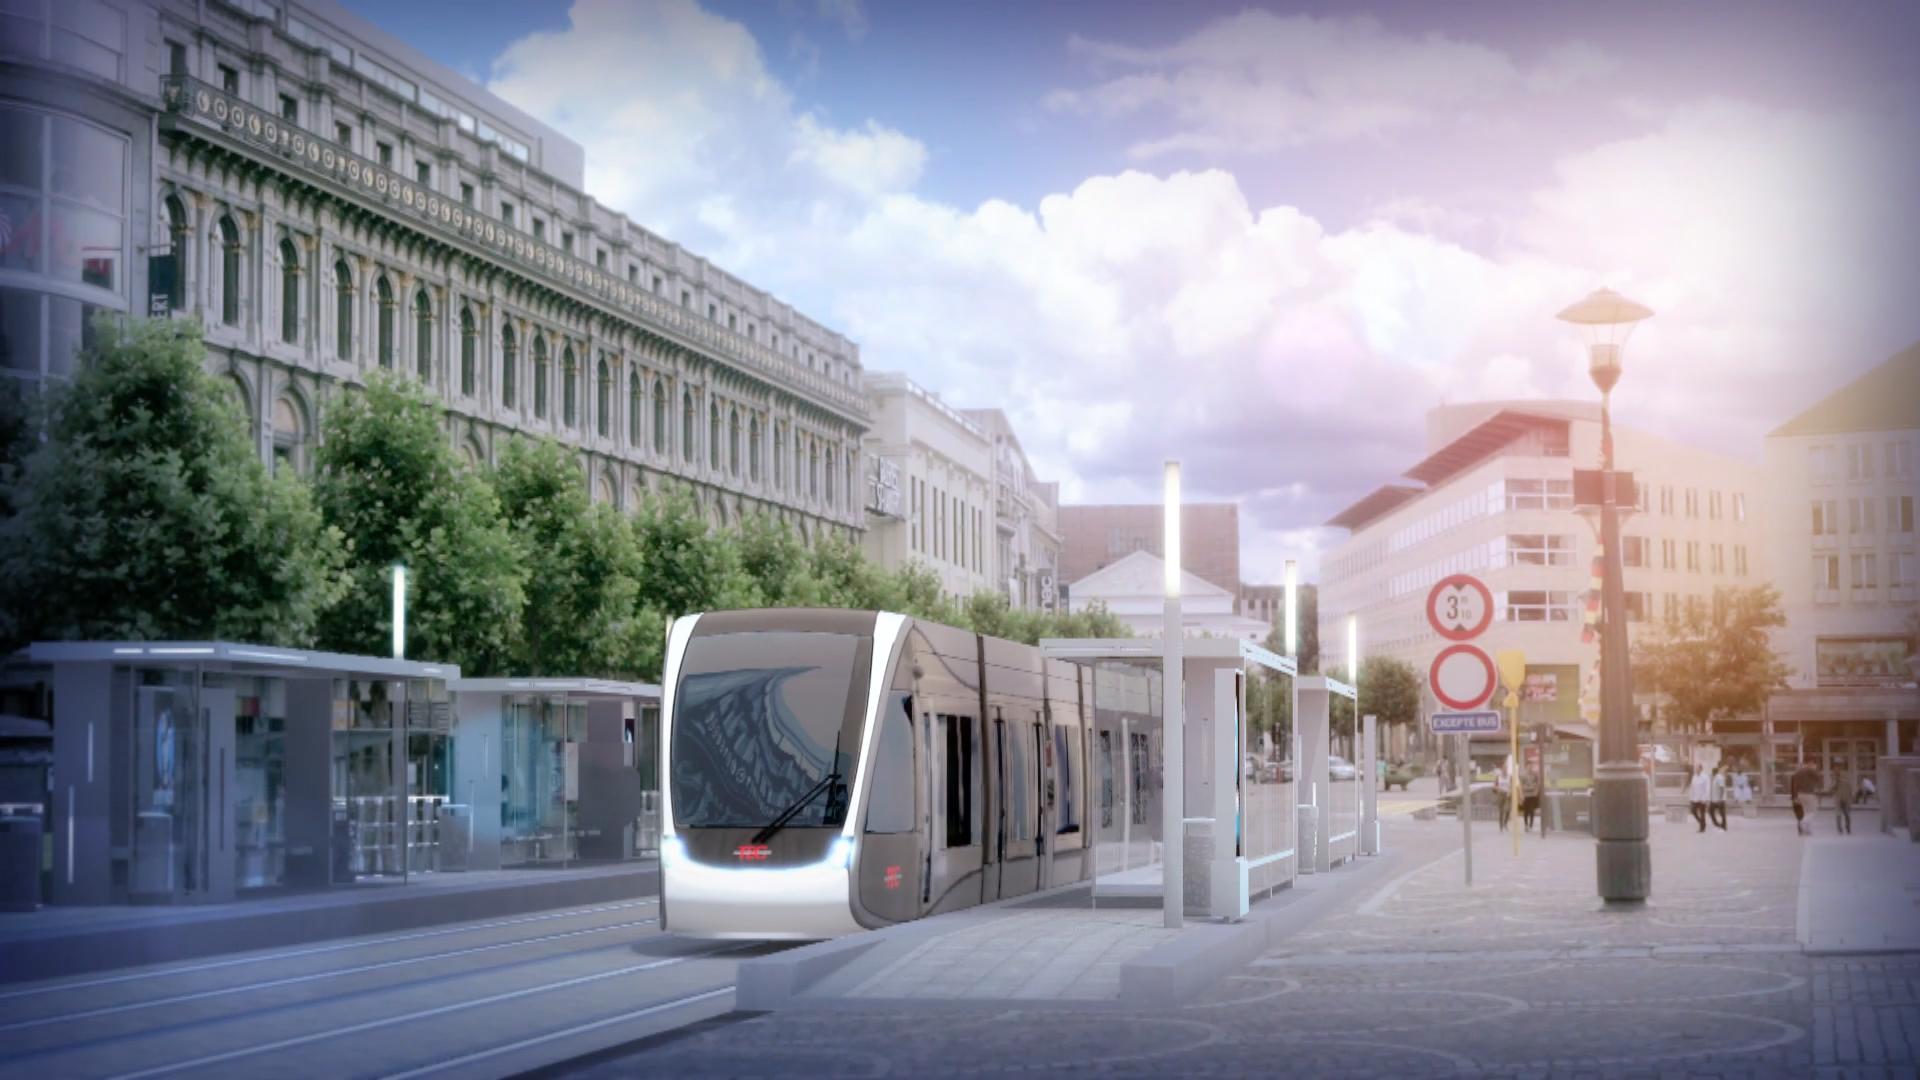 Vizualizace tramvaje v Lutychu. (zdroj: CAF)